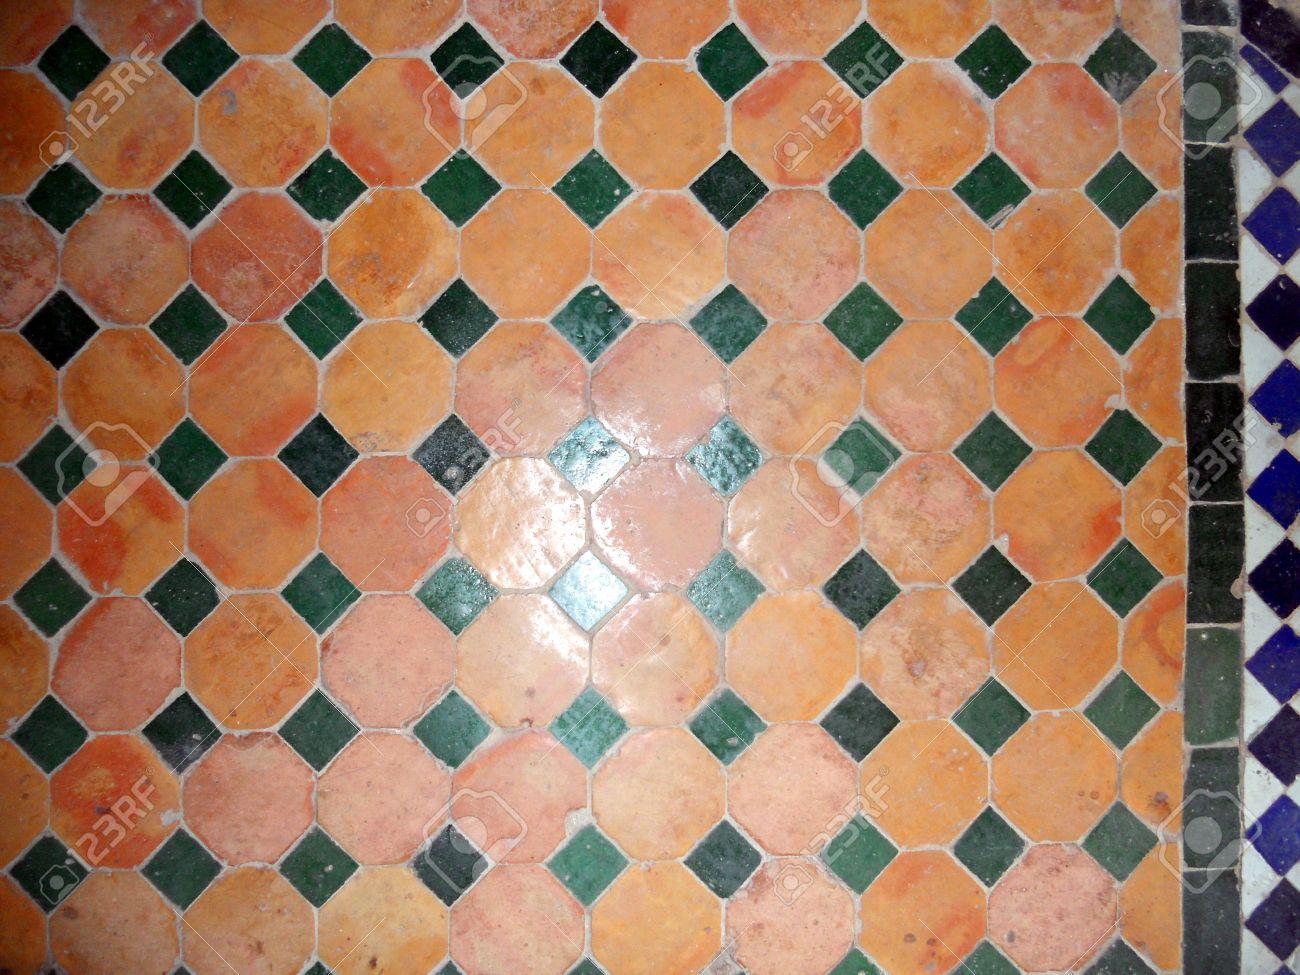 Moroccan tiles colored floor tiles in a pattern morocco stock moroccan tiles colored floor tiles in a pattern morocco stock photo 14810306 dailygadgetfo Gallery